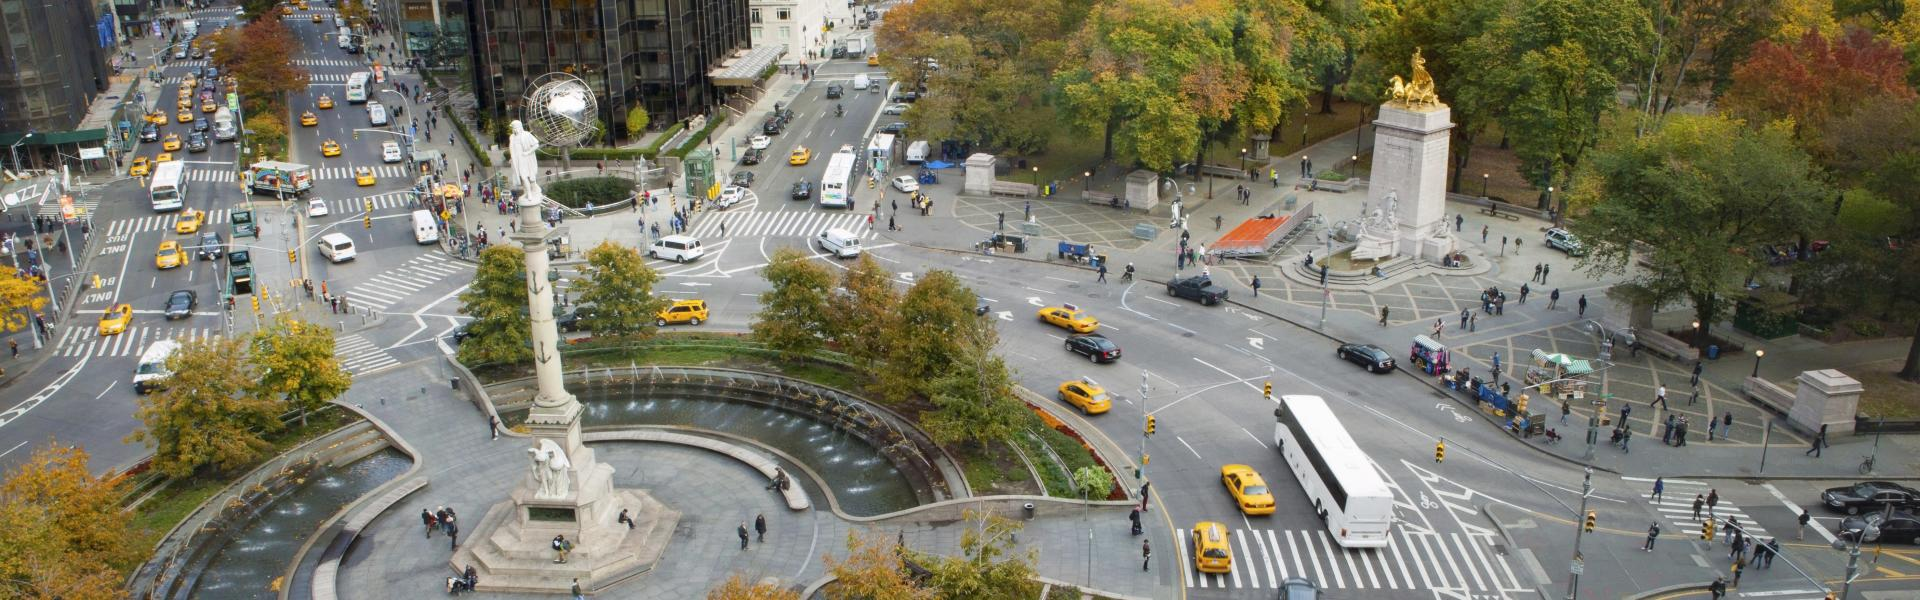 Columbus Circle, Overhead